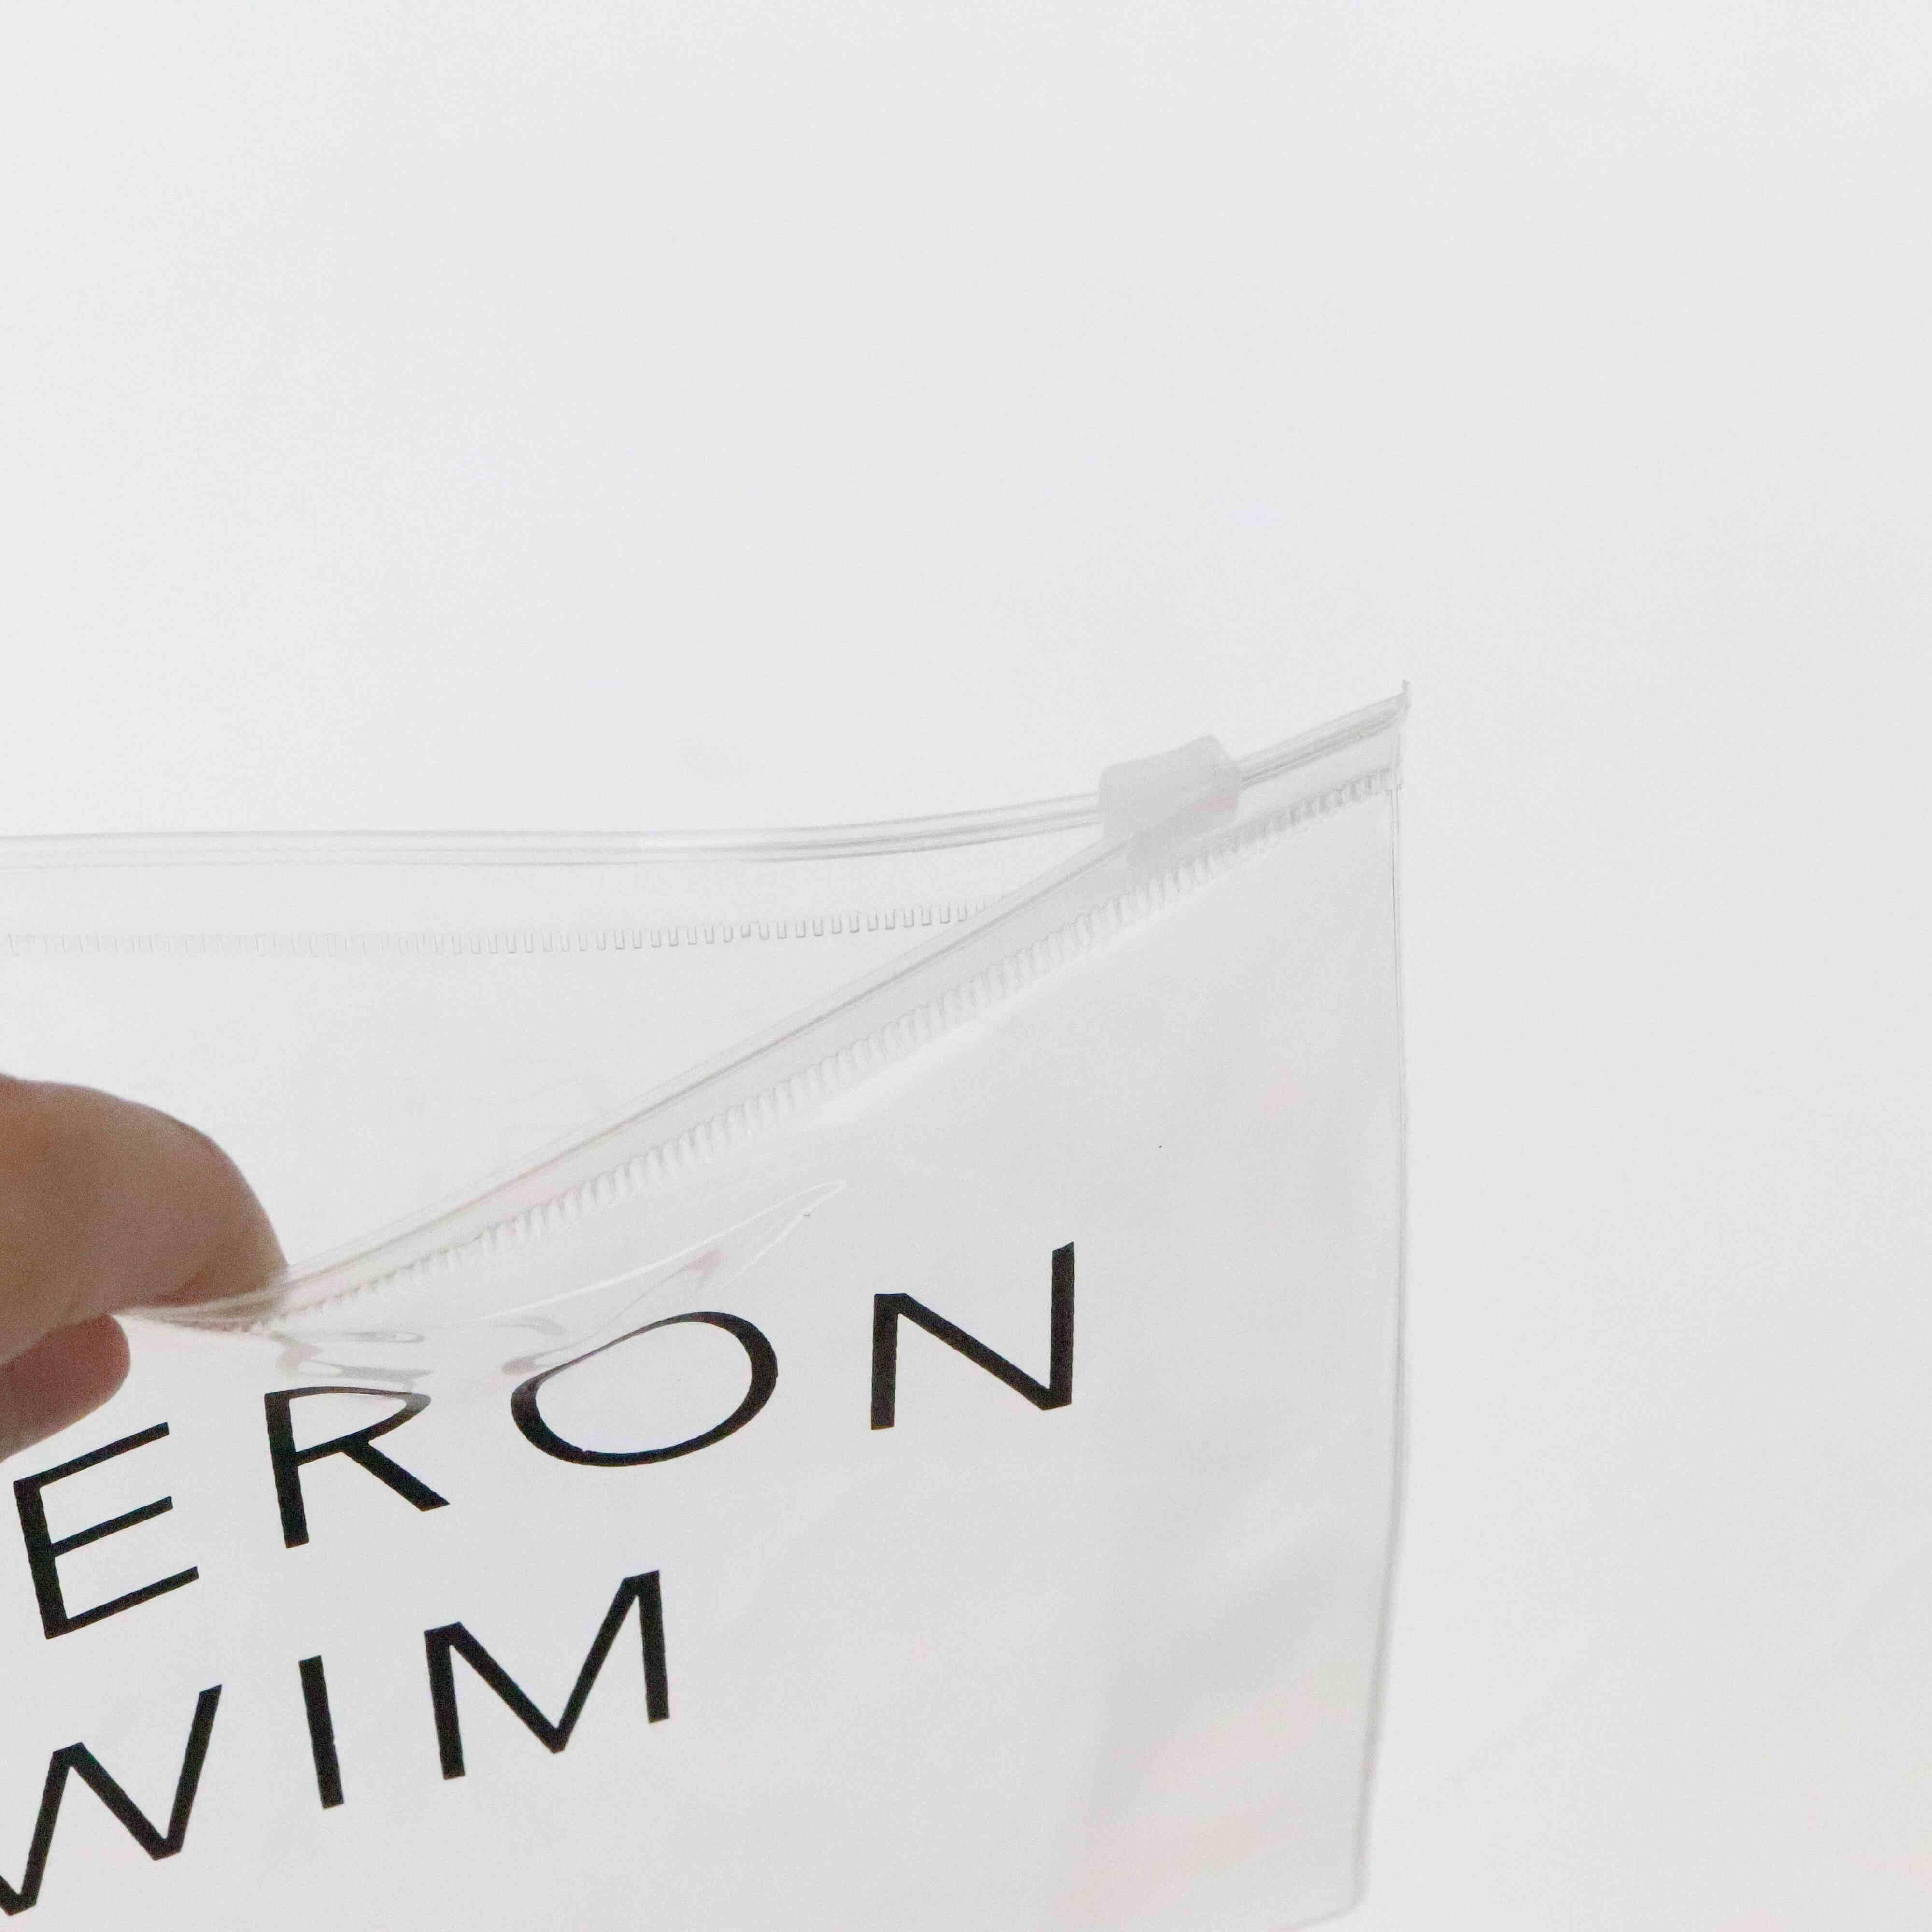 Kustom Transparan Buram Tas Ziplock, Pvc Biodegradable Baju Renang Pakaian Plastik Kosmetik Zipper Pouch